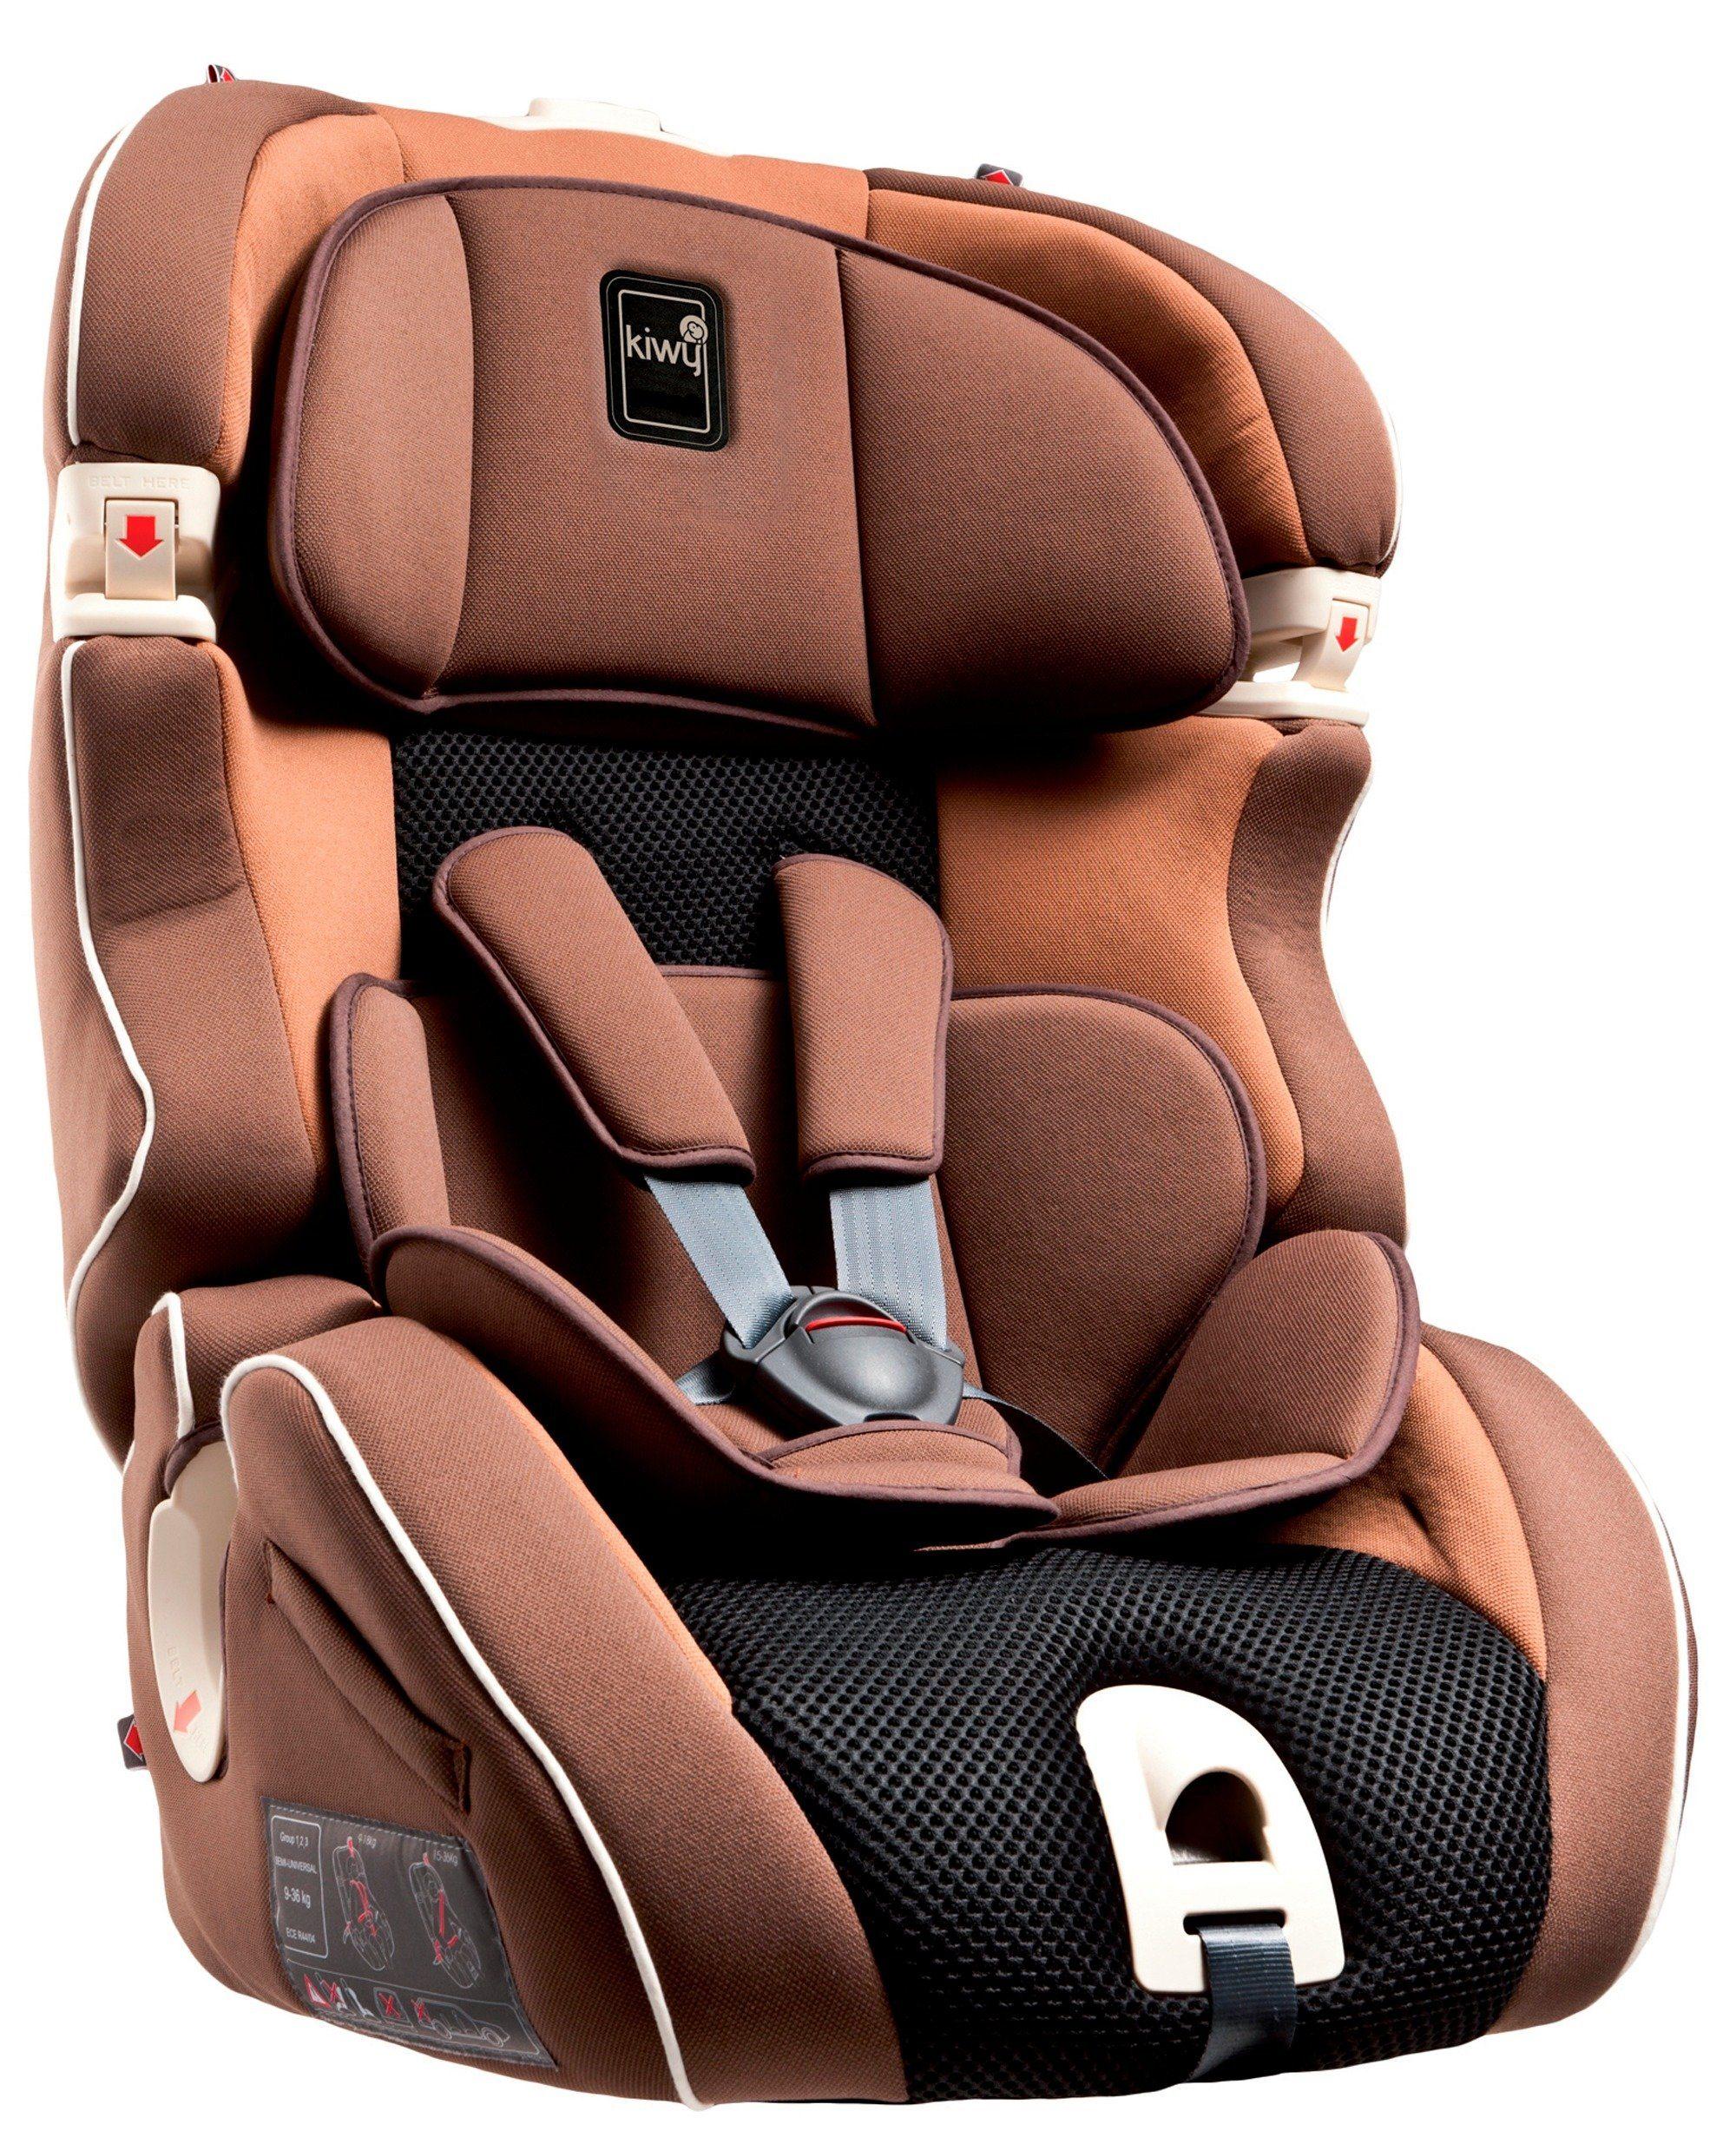 Kiwy Kindersitz »kiwy SL123 Universal, mokka«